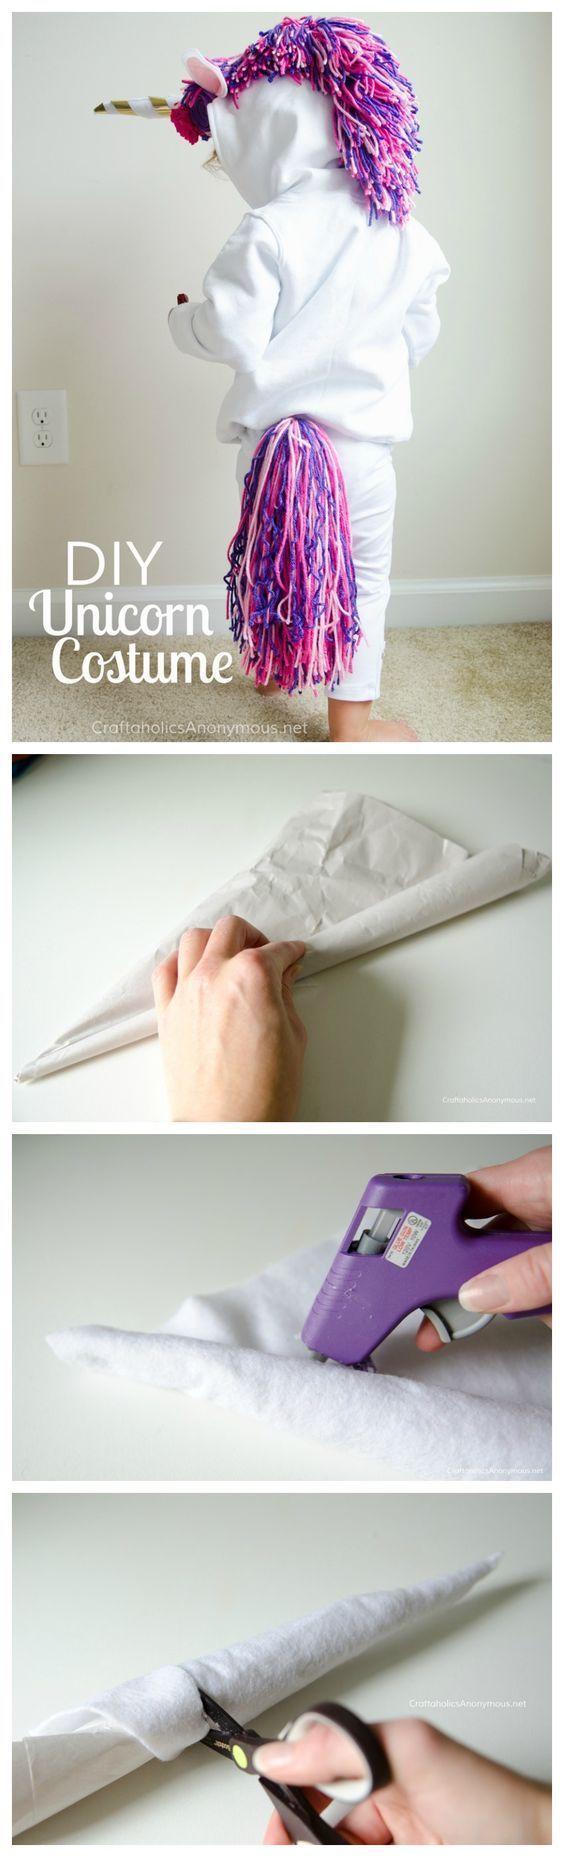 Diy Unicorn Costume Tutorial Costume Patterns Halloween Costumes